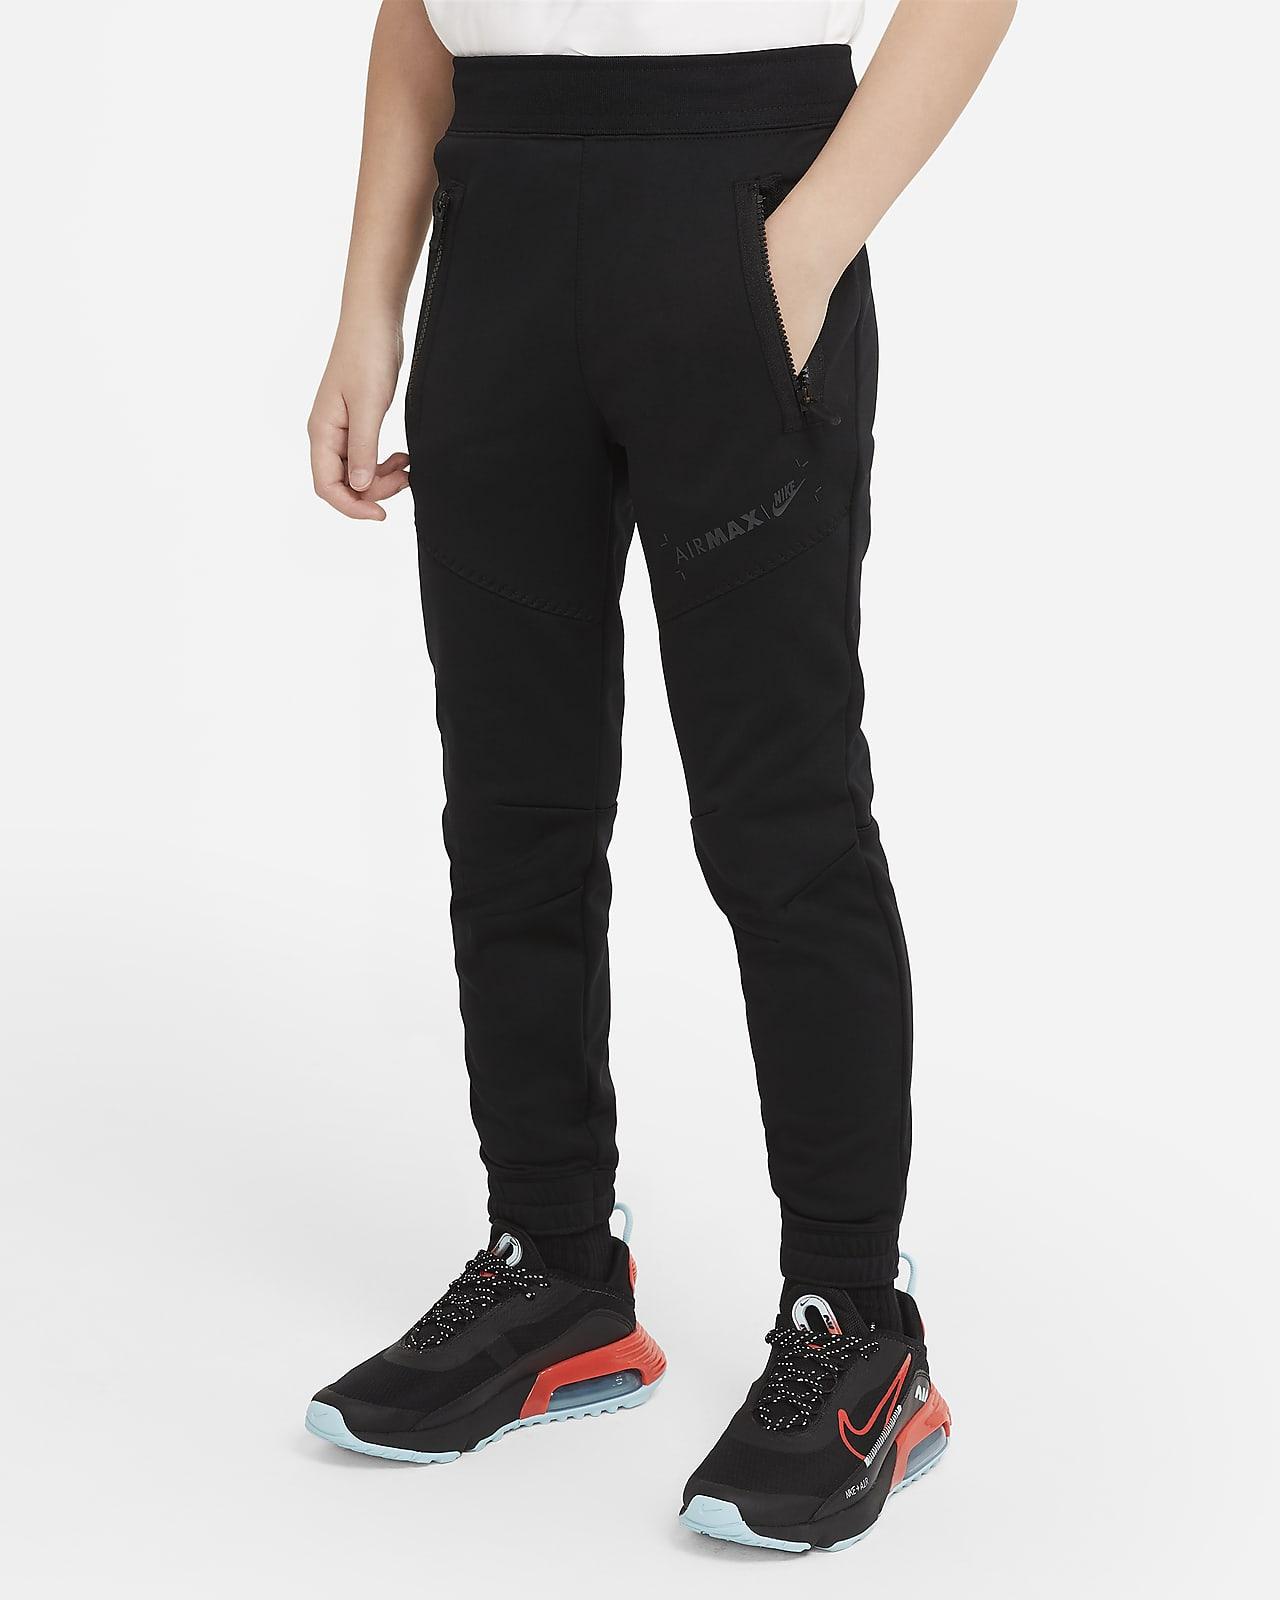 Calças de lã cardada Nike Sportswear Air Max Júnior (Rapaz)